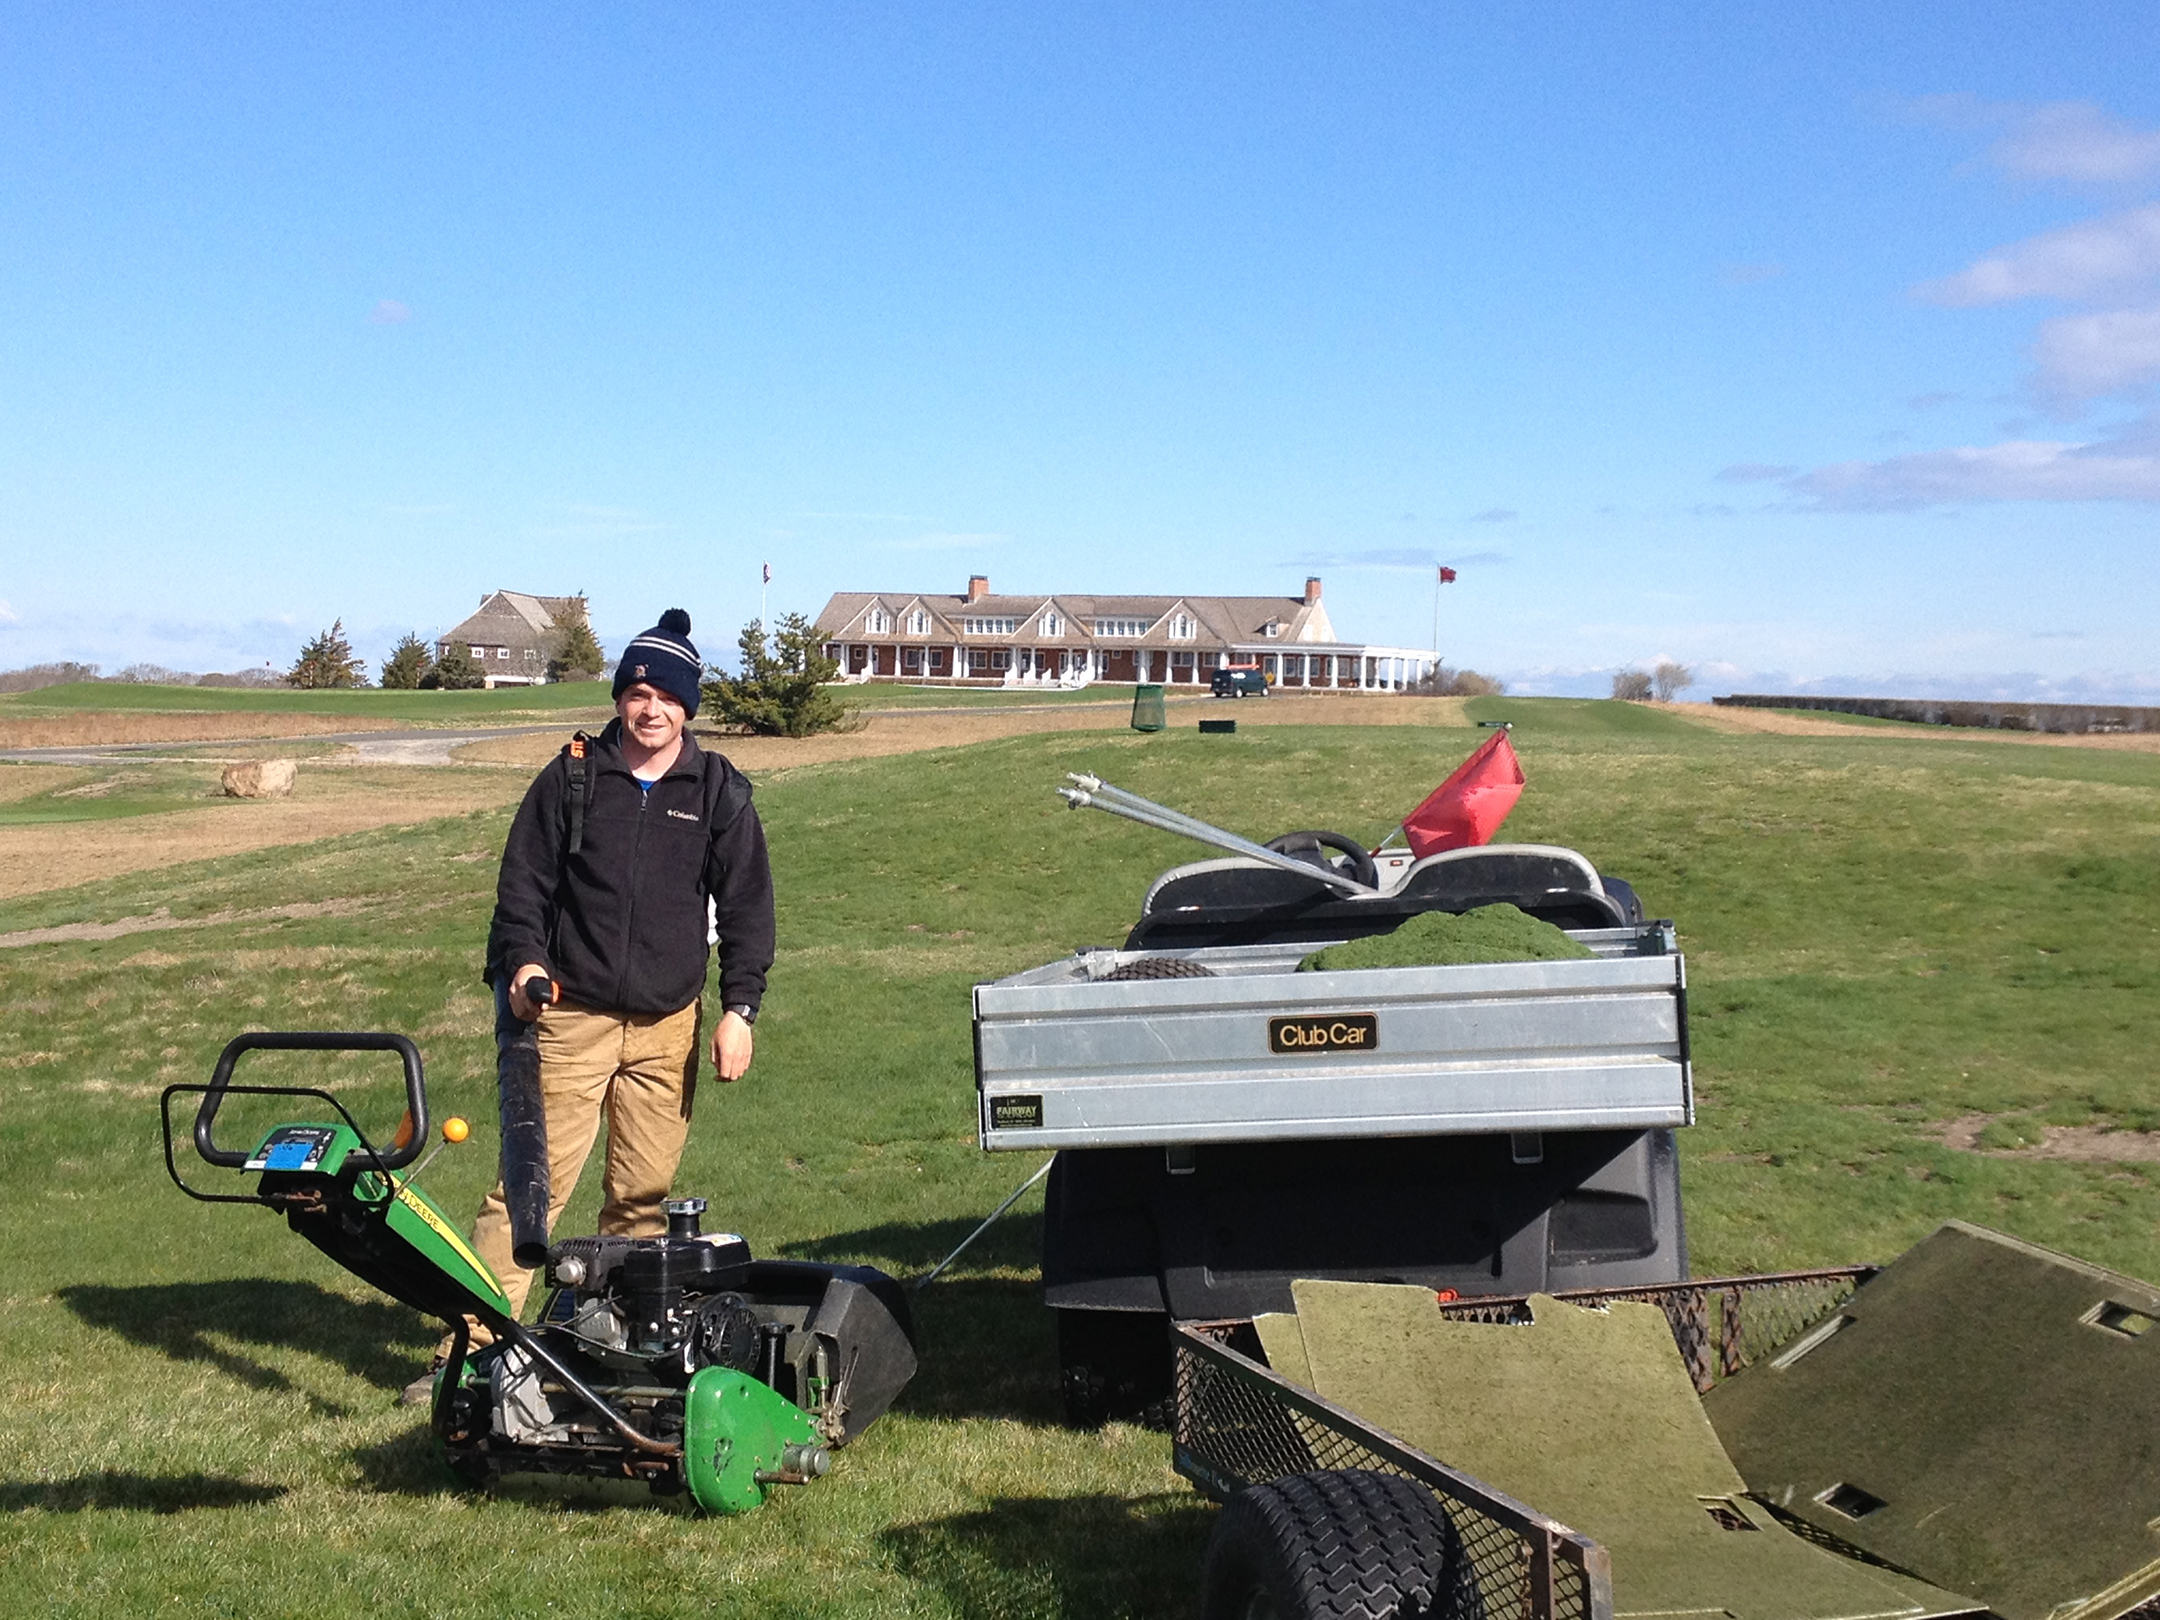 2015 Intern at Shinnecock Hills Golf Club